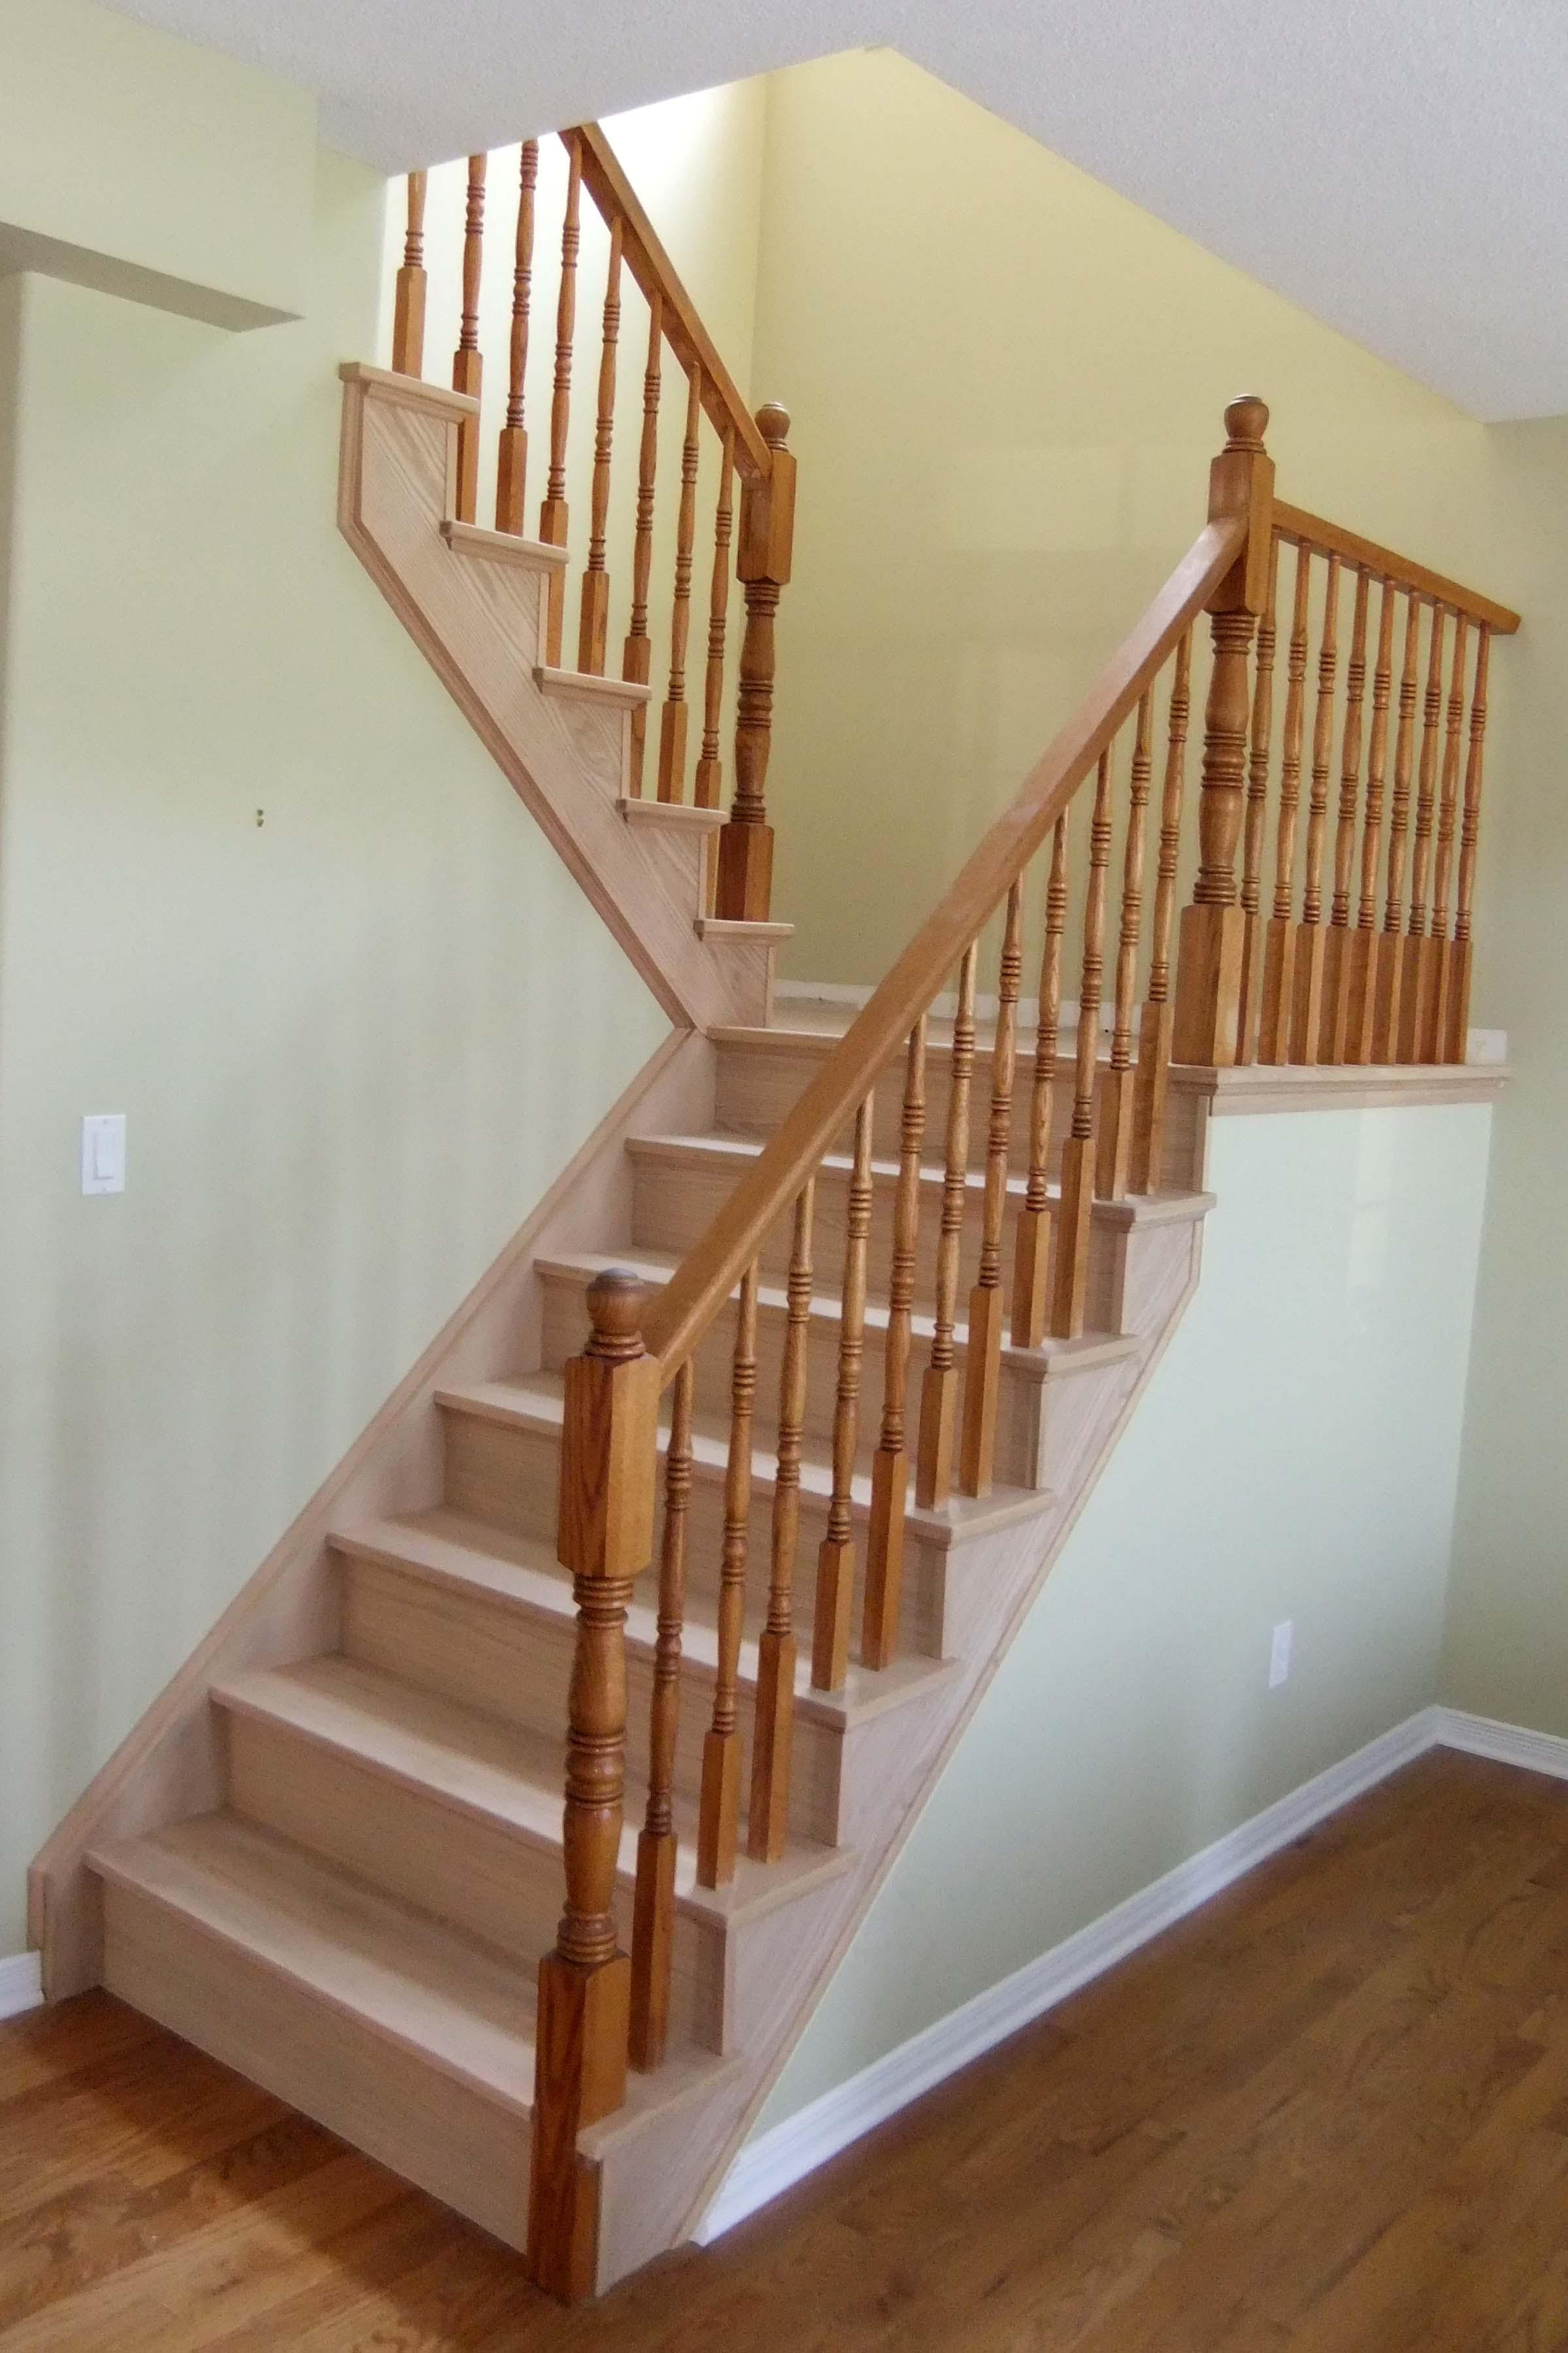 Straight oak stair resurfacing using existing railing